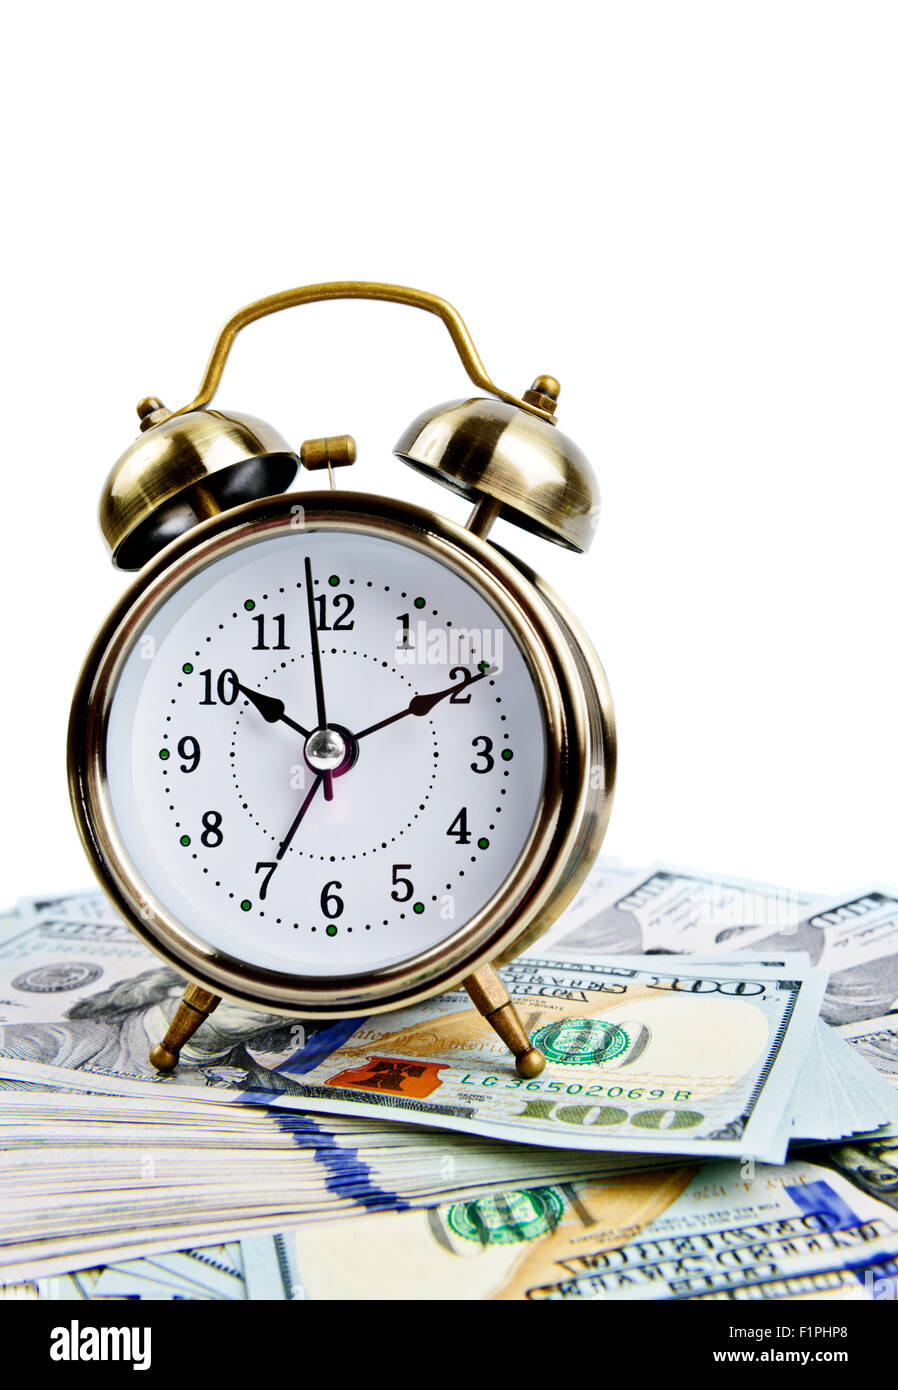 Vintage alarm clock over money - Stock Image